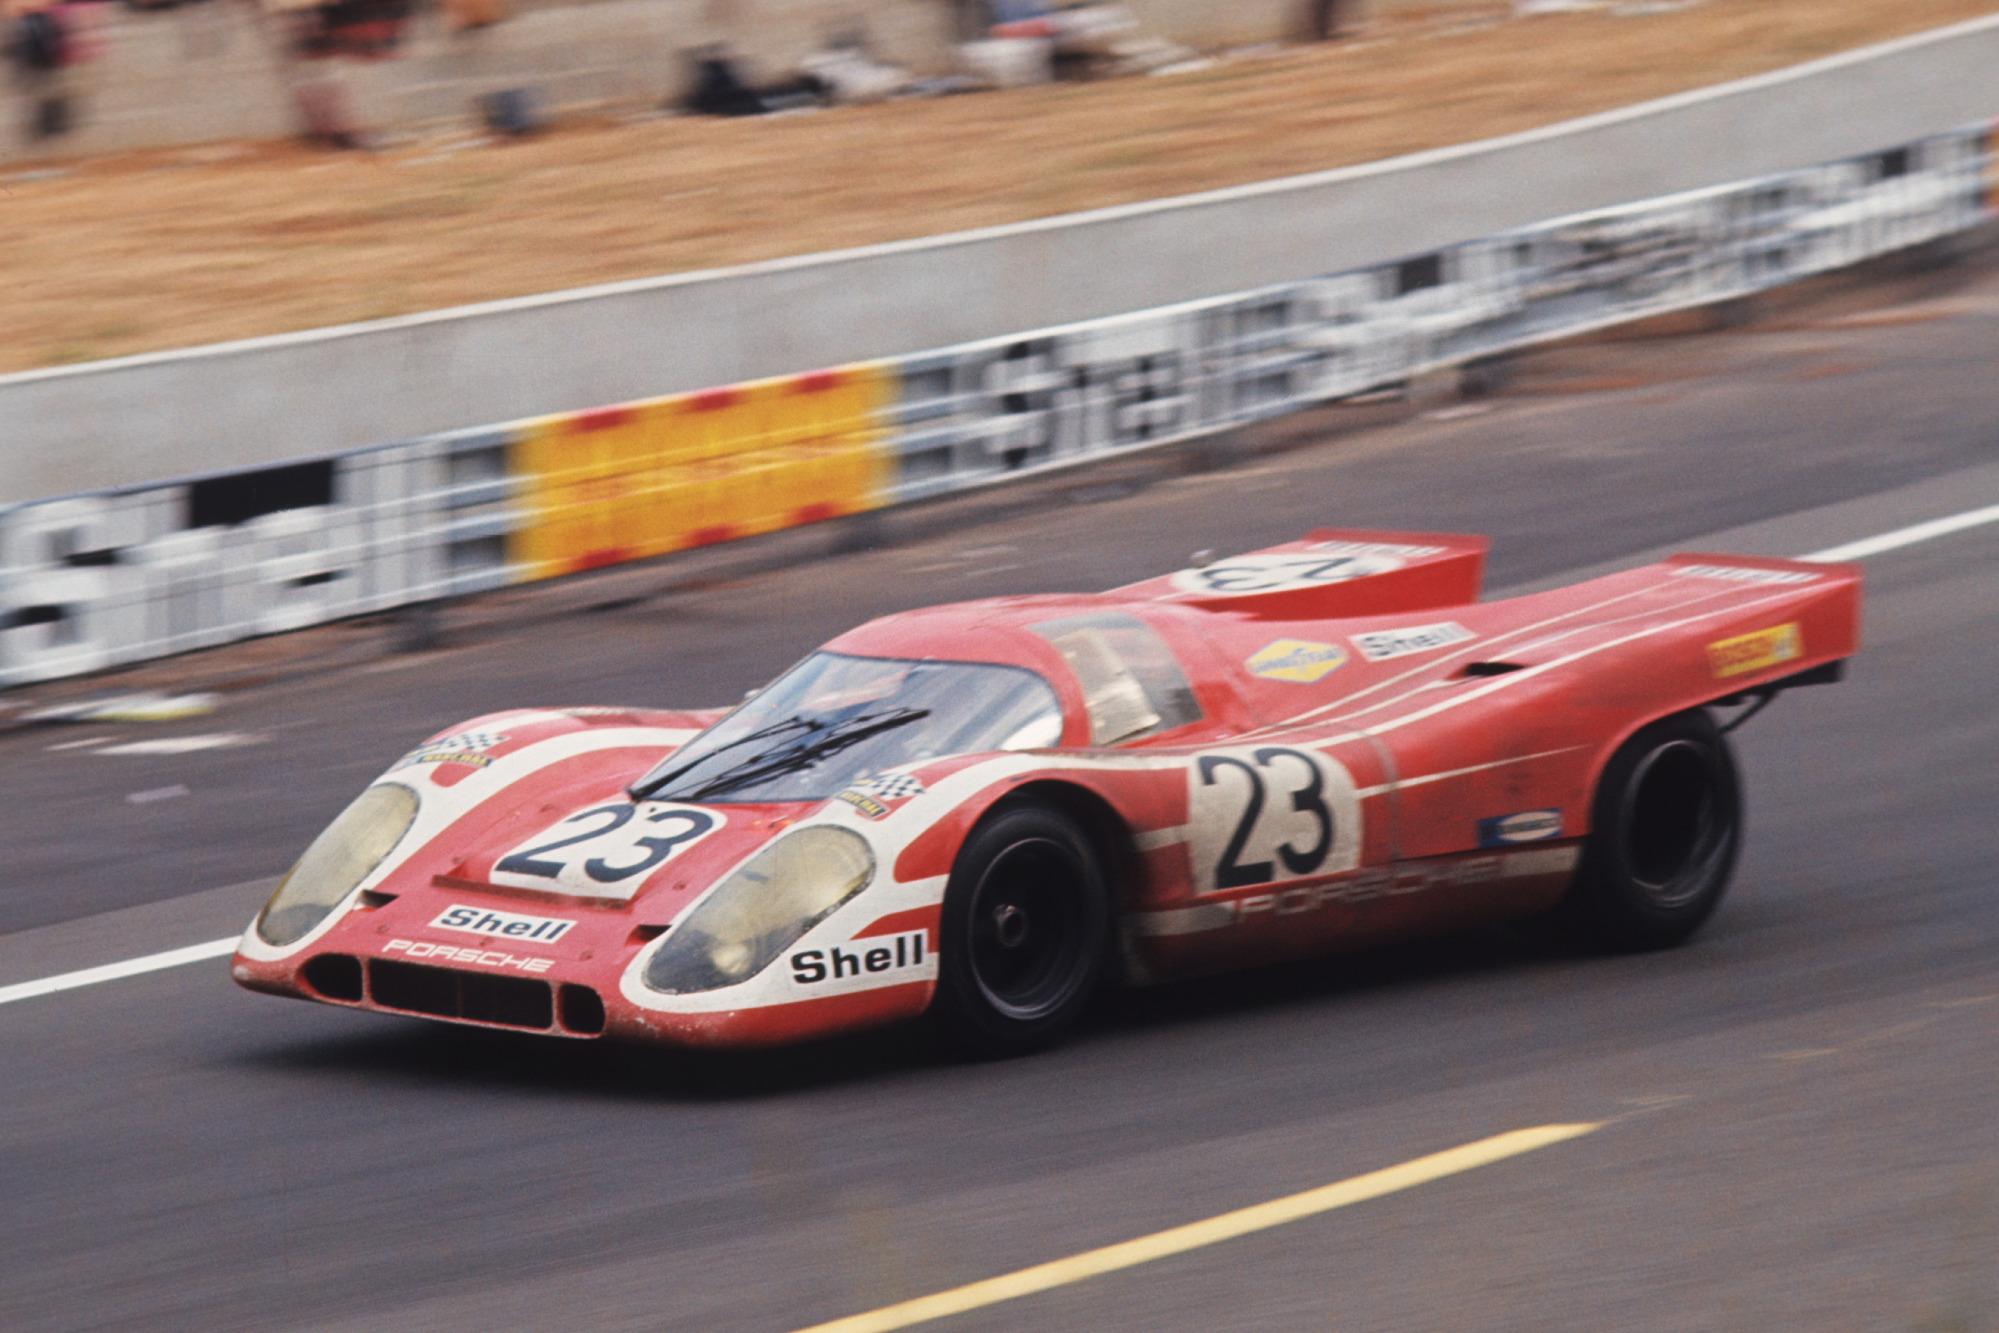 Porsche 917, 1970 Le Mans